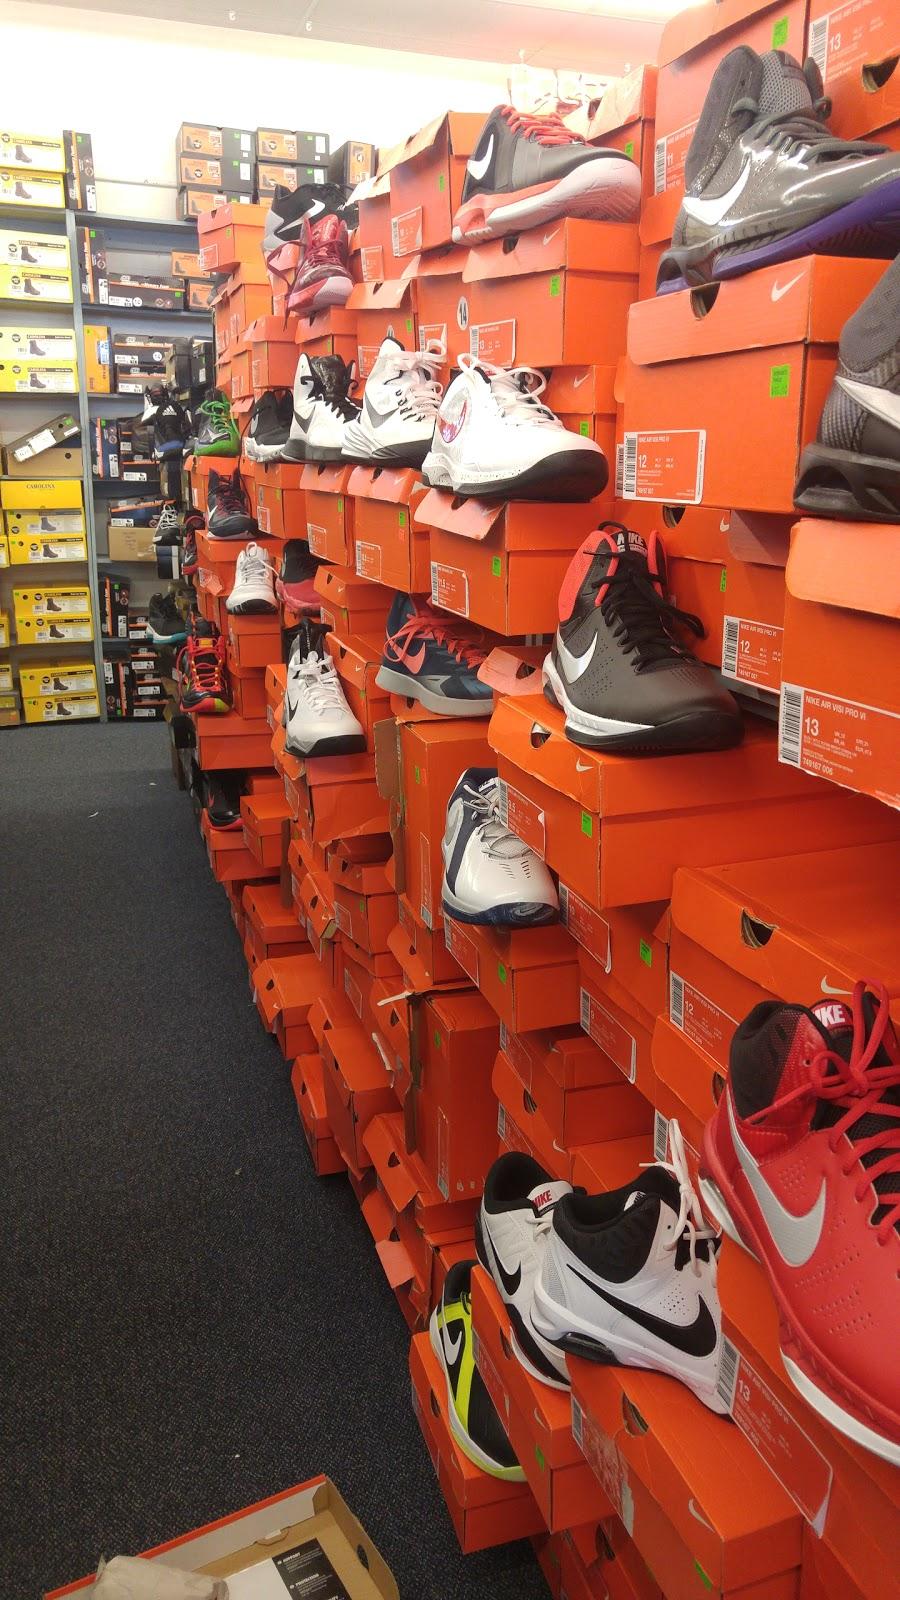 Rogans Shoes - shoe store  | Photo 5 of 10 | Address: 649 S Taylor Dr, Sheboygan, WI 53081, USA | Phone: (920) 451-0188